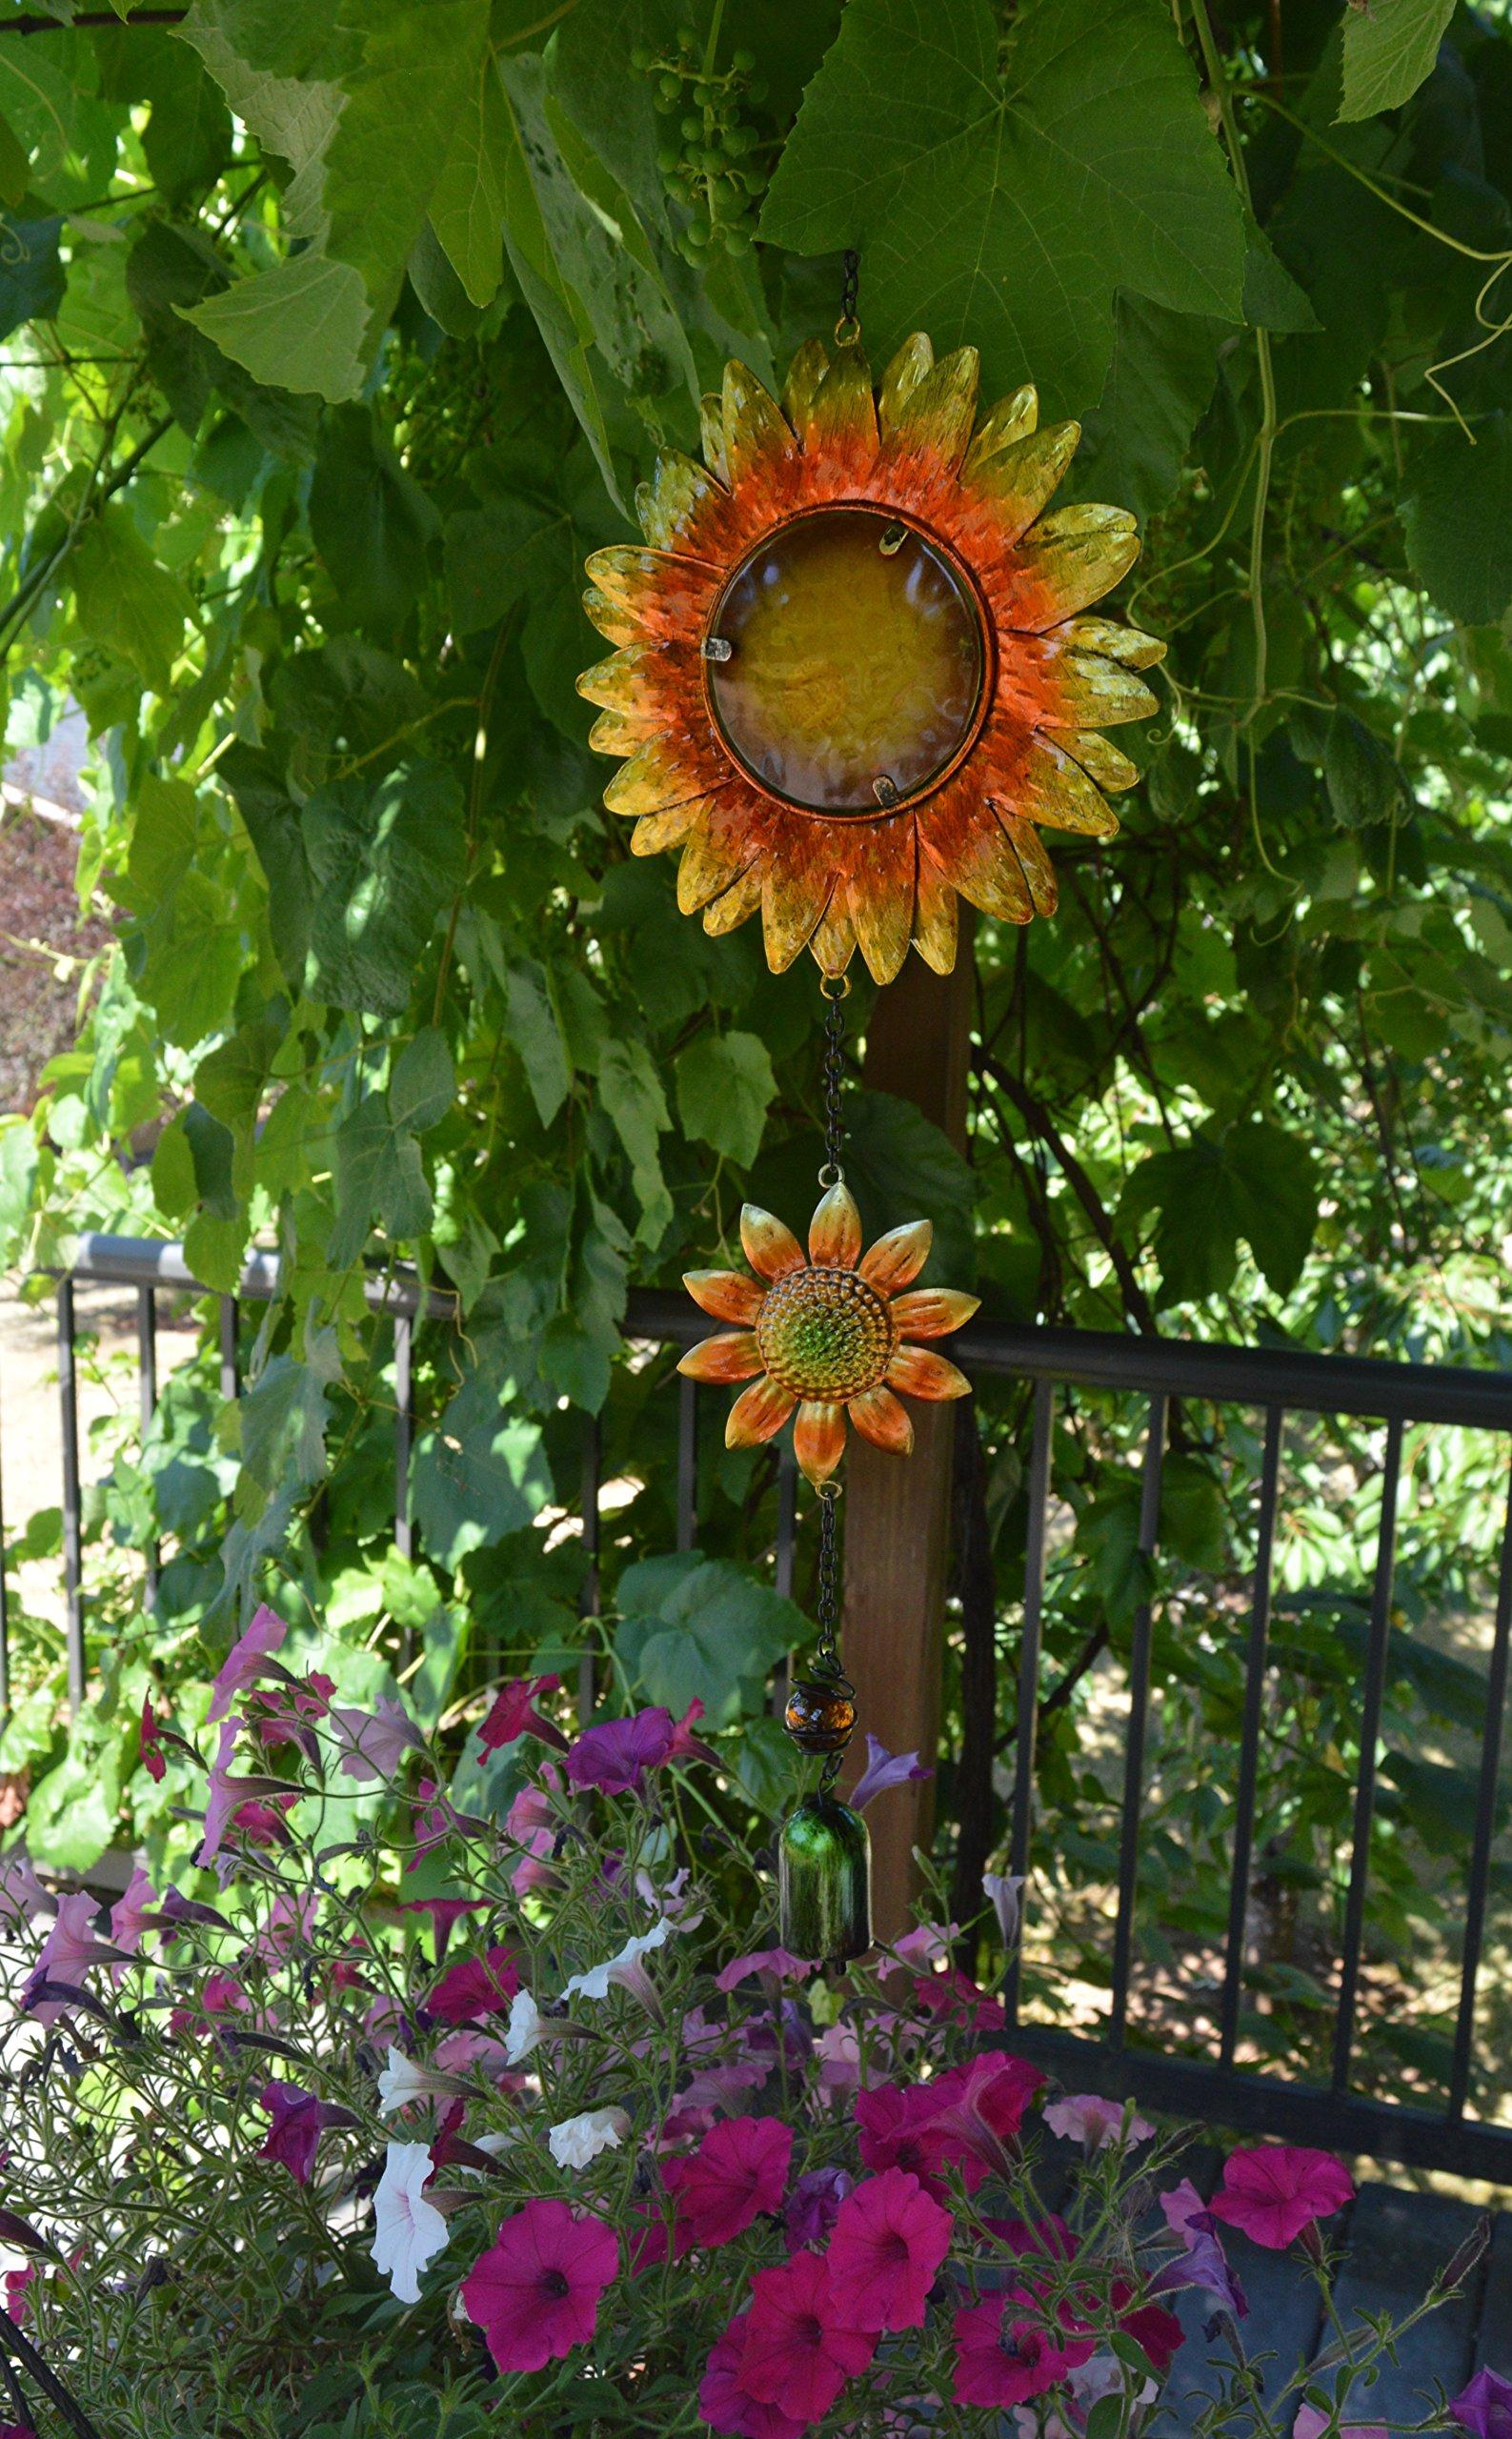 Sunset Vista Designs Hanging Decoration Garden Bell, 26-Inch, Sunflowers by Sunset Vista Designs